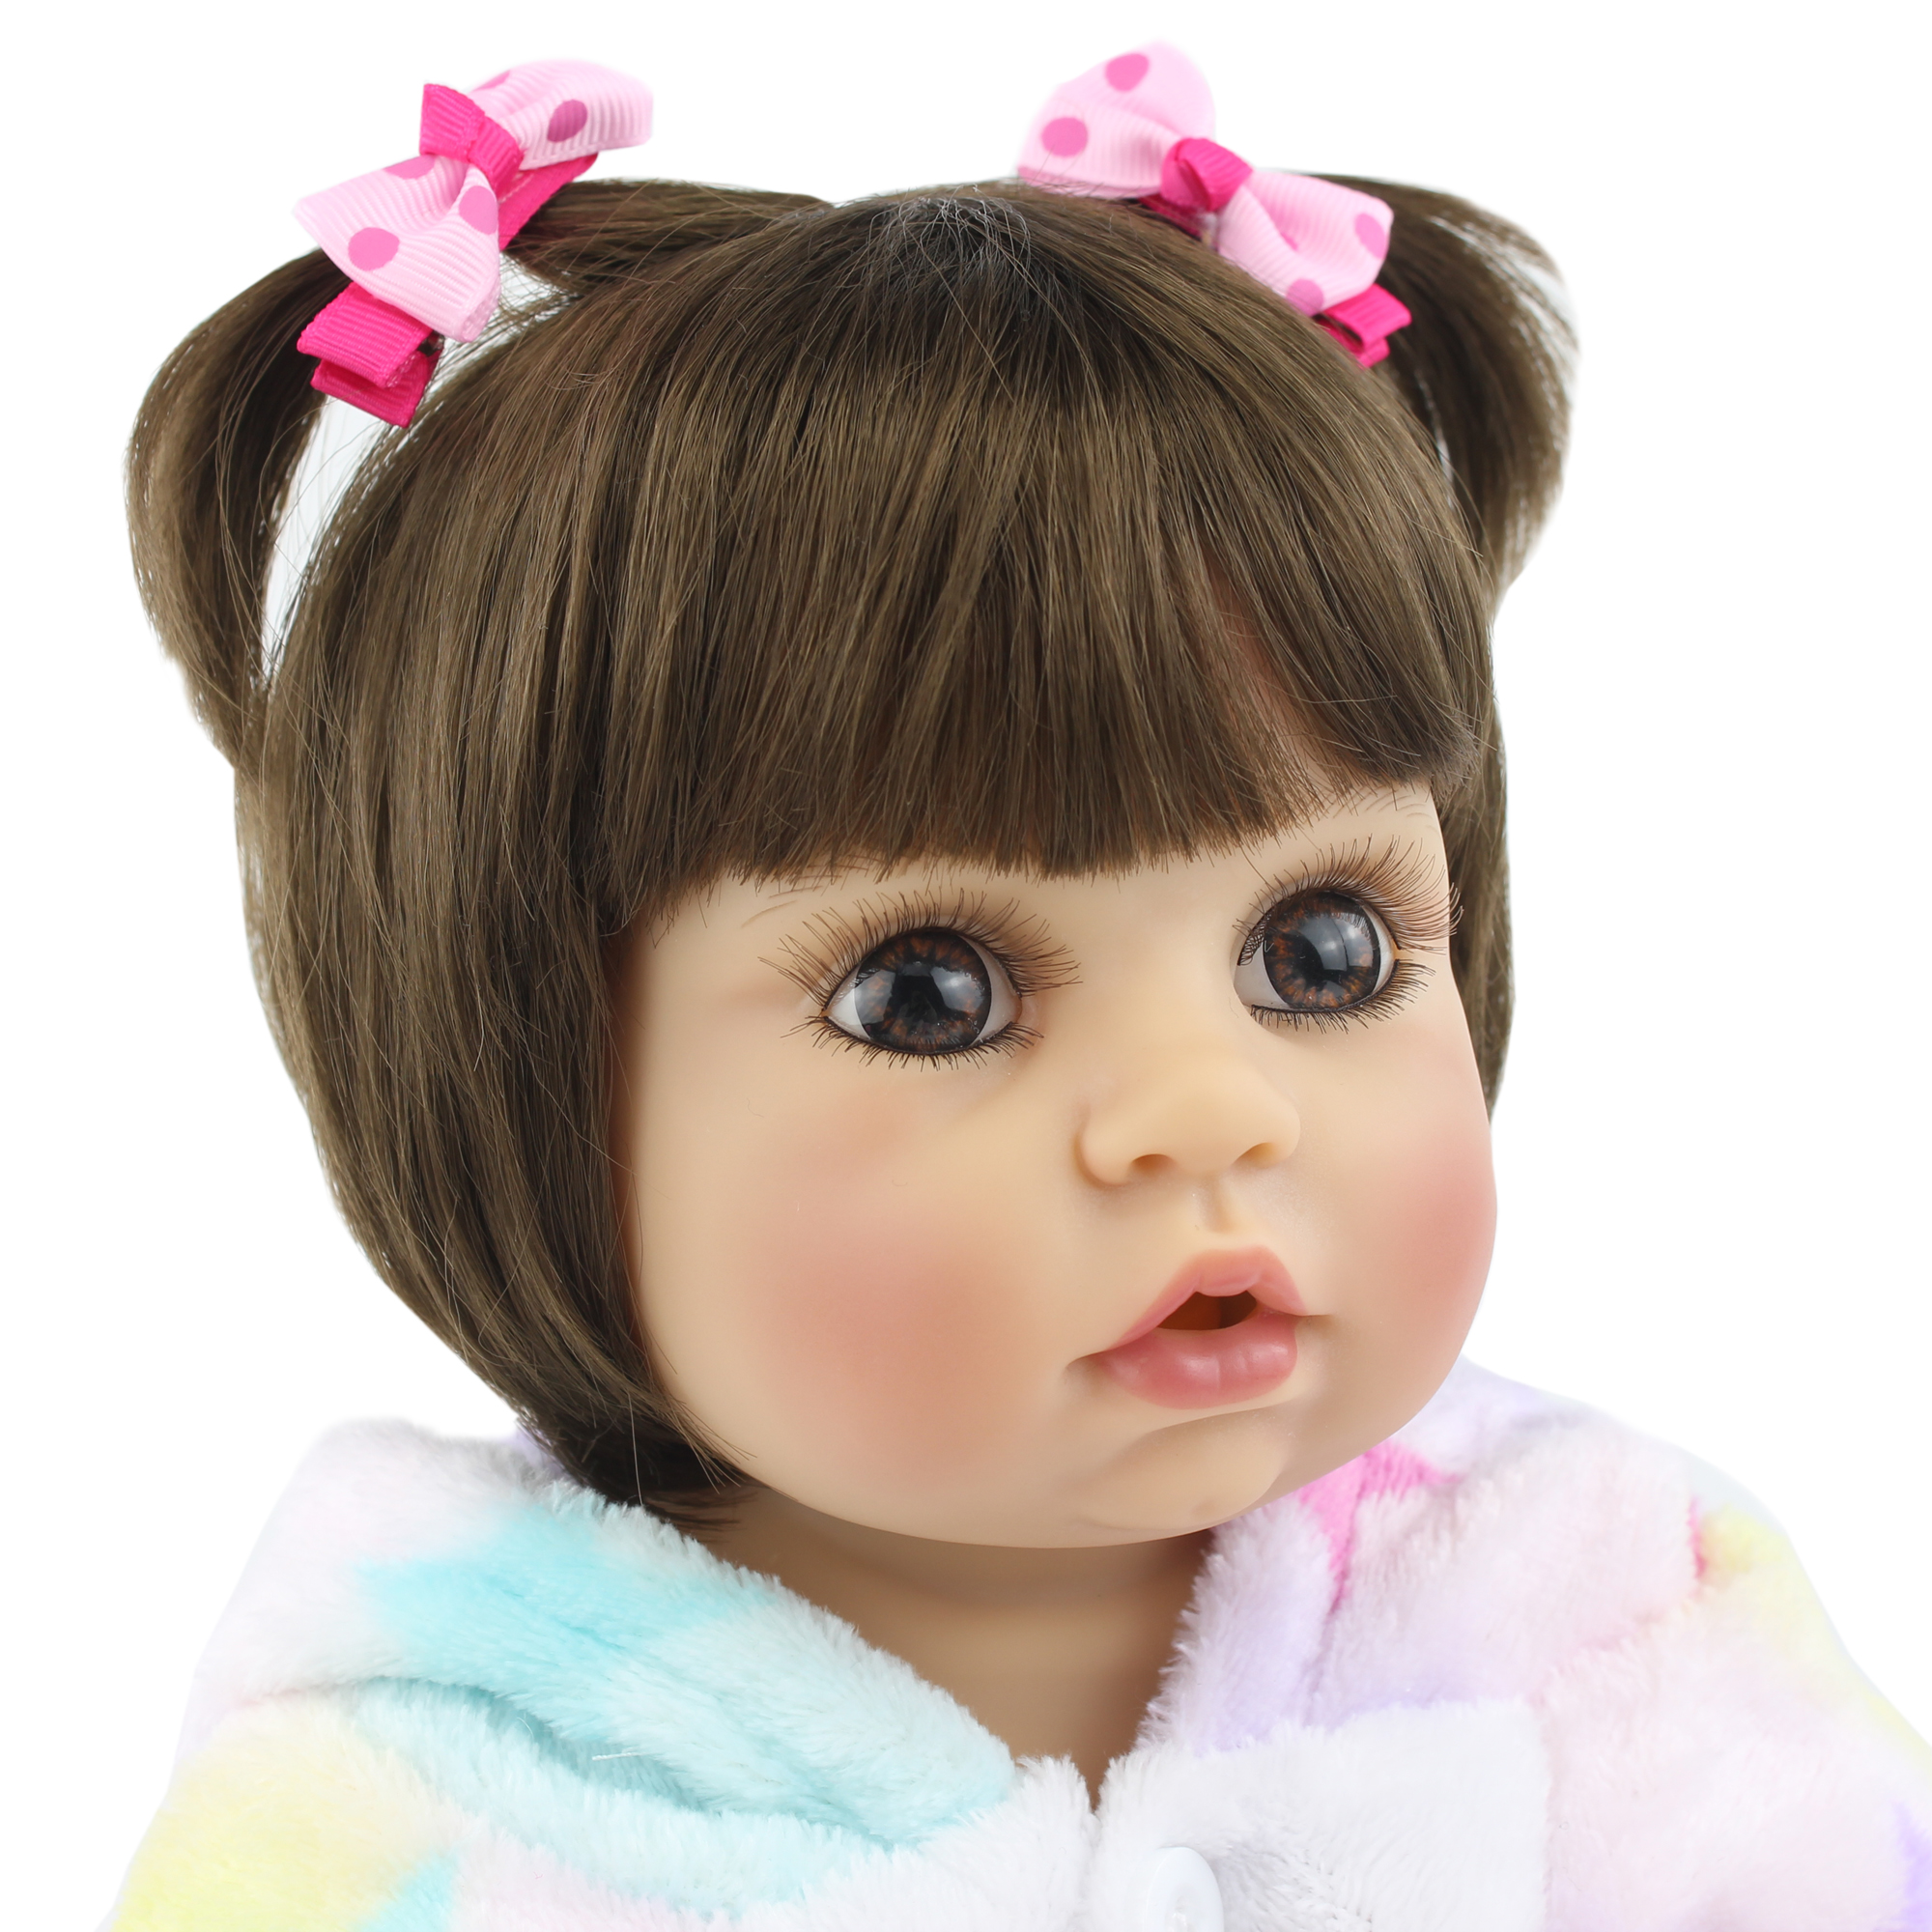 55cm Full Silicone Body Reborn Baby Doll Toy 22 inch Newborn Princess Babies Toddler Bebe Boneca